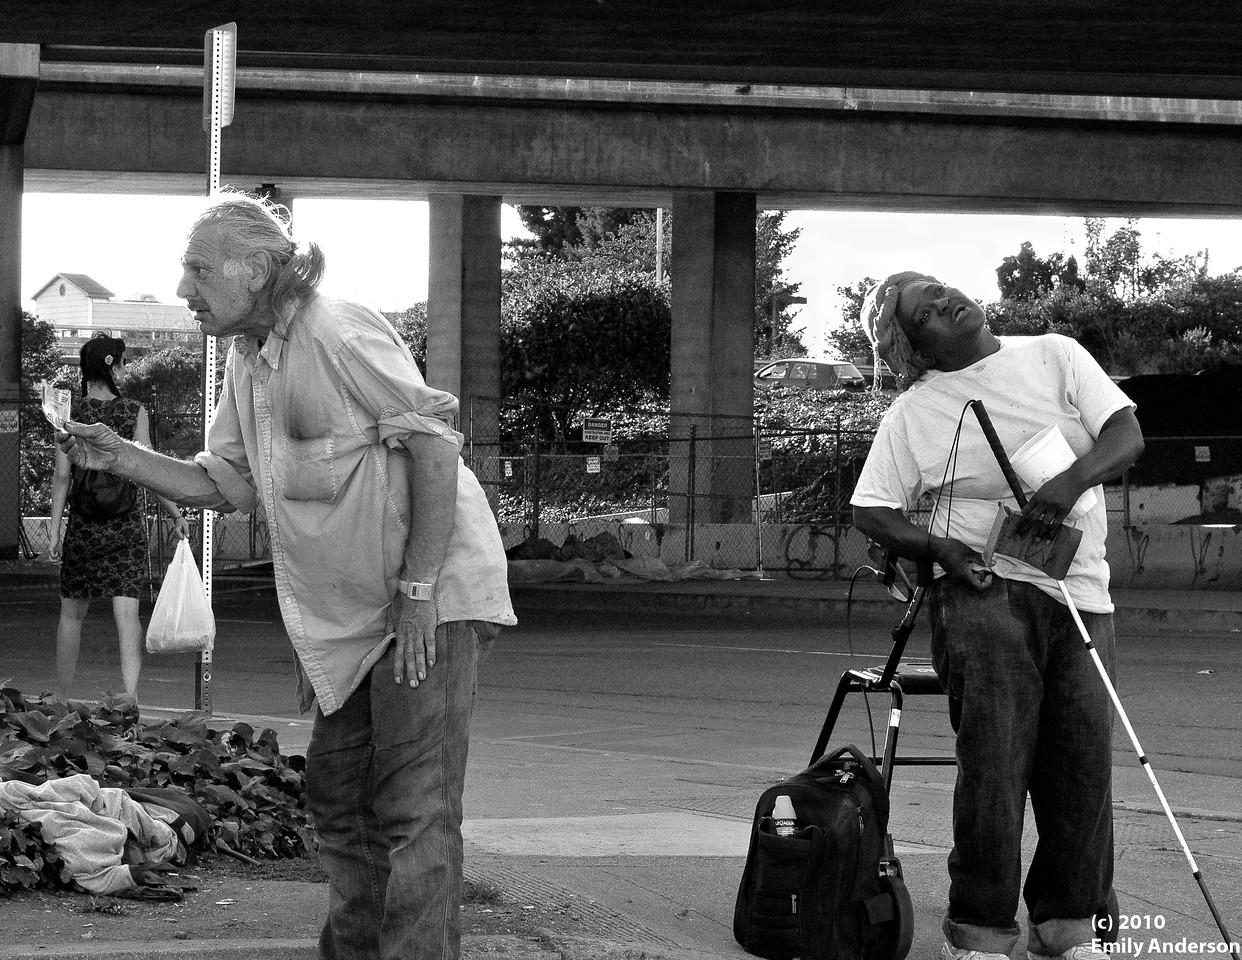 Emily Anderson - Homeless Actors  - http://www.adventureseekerphotography.com